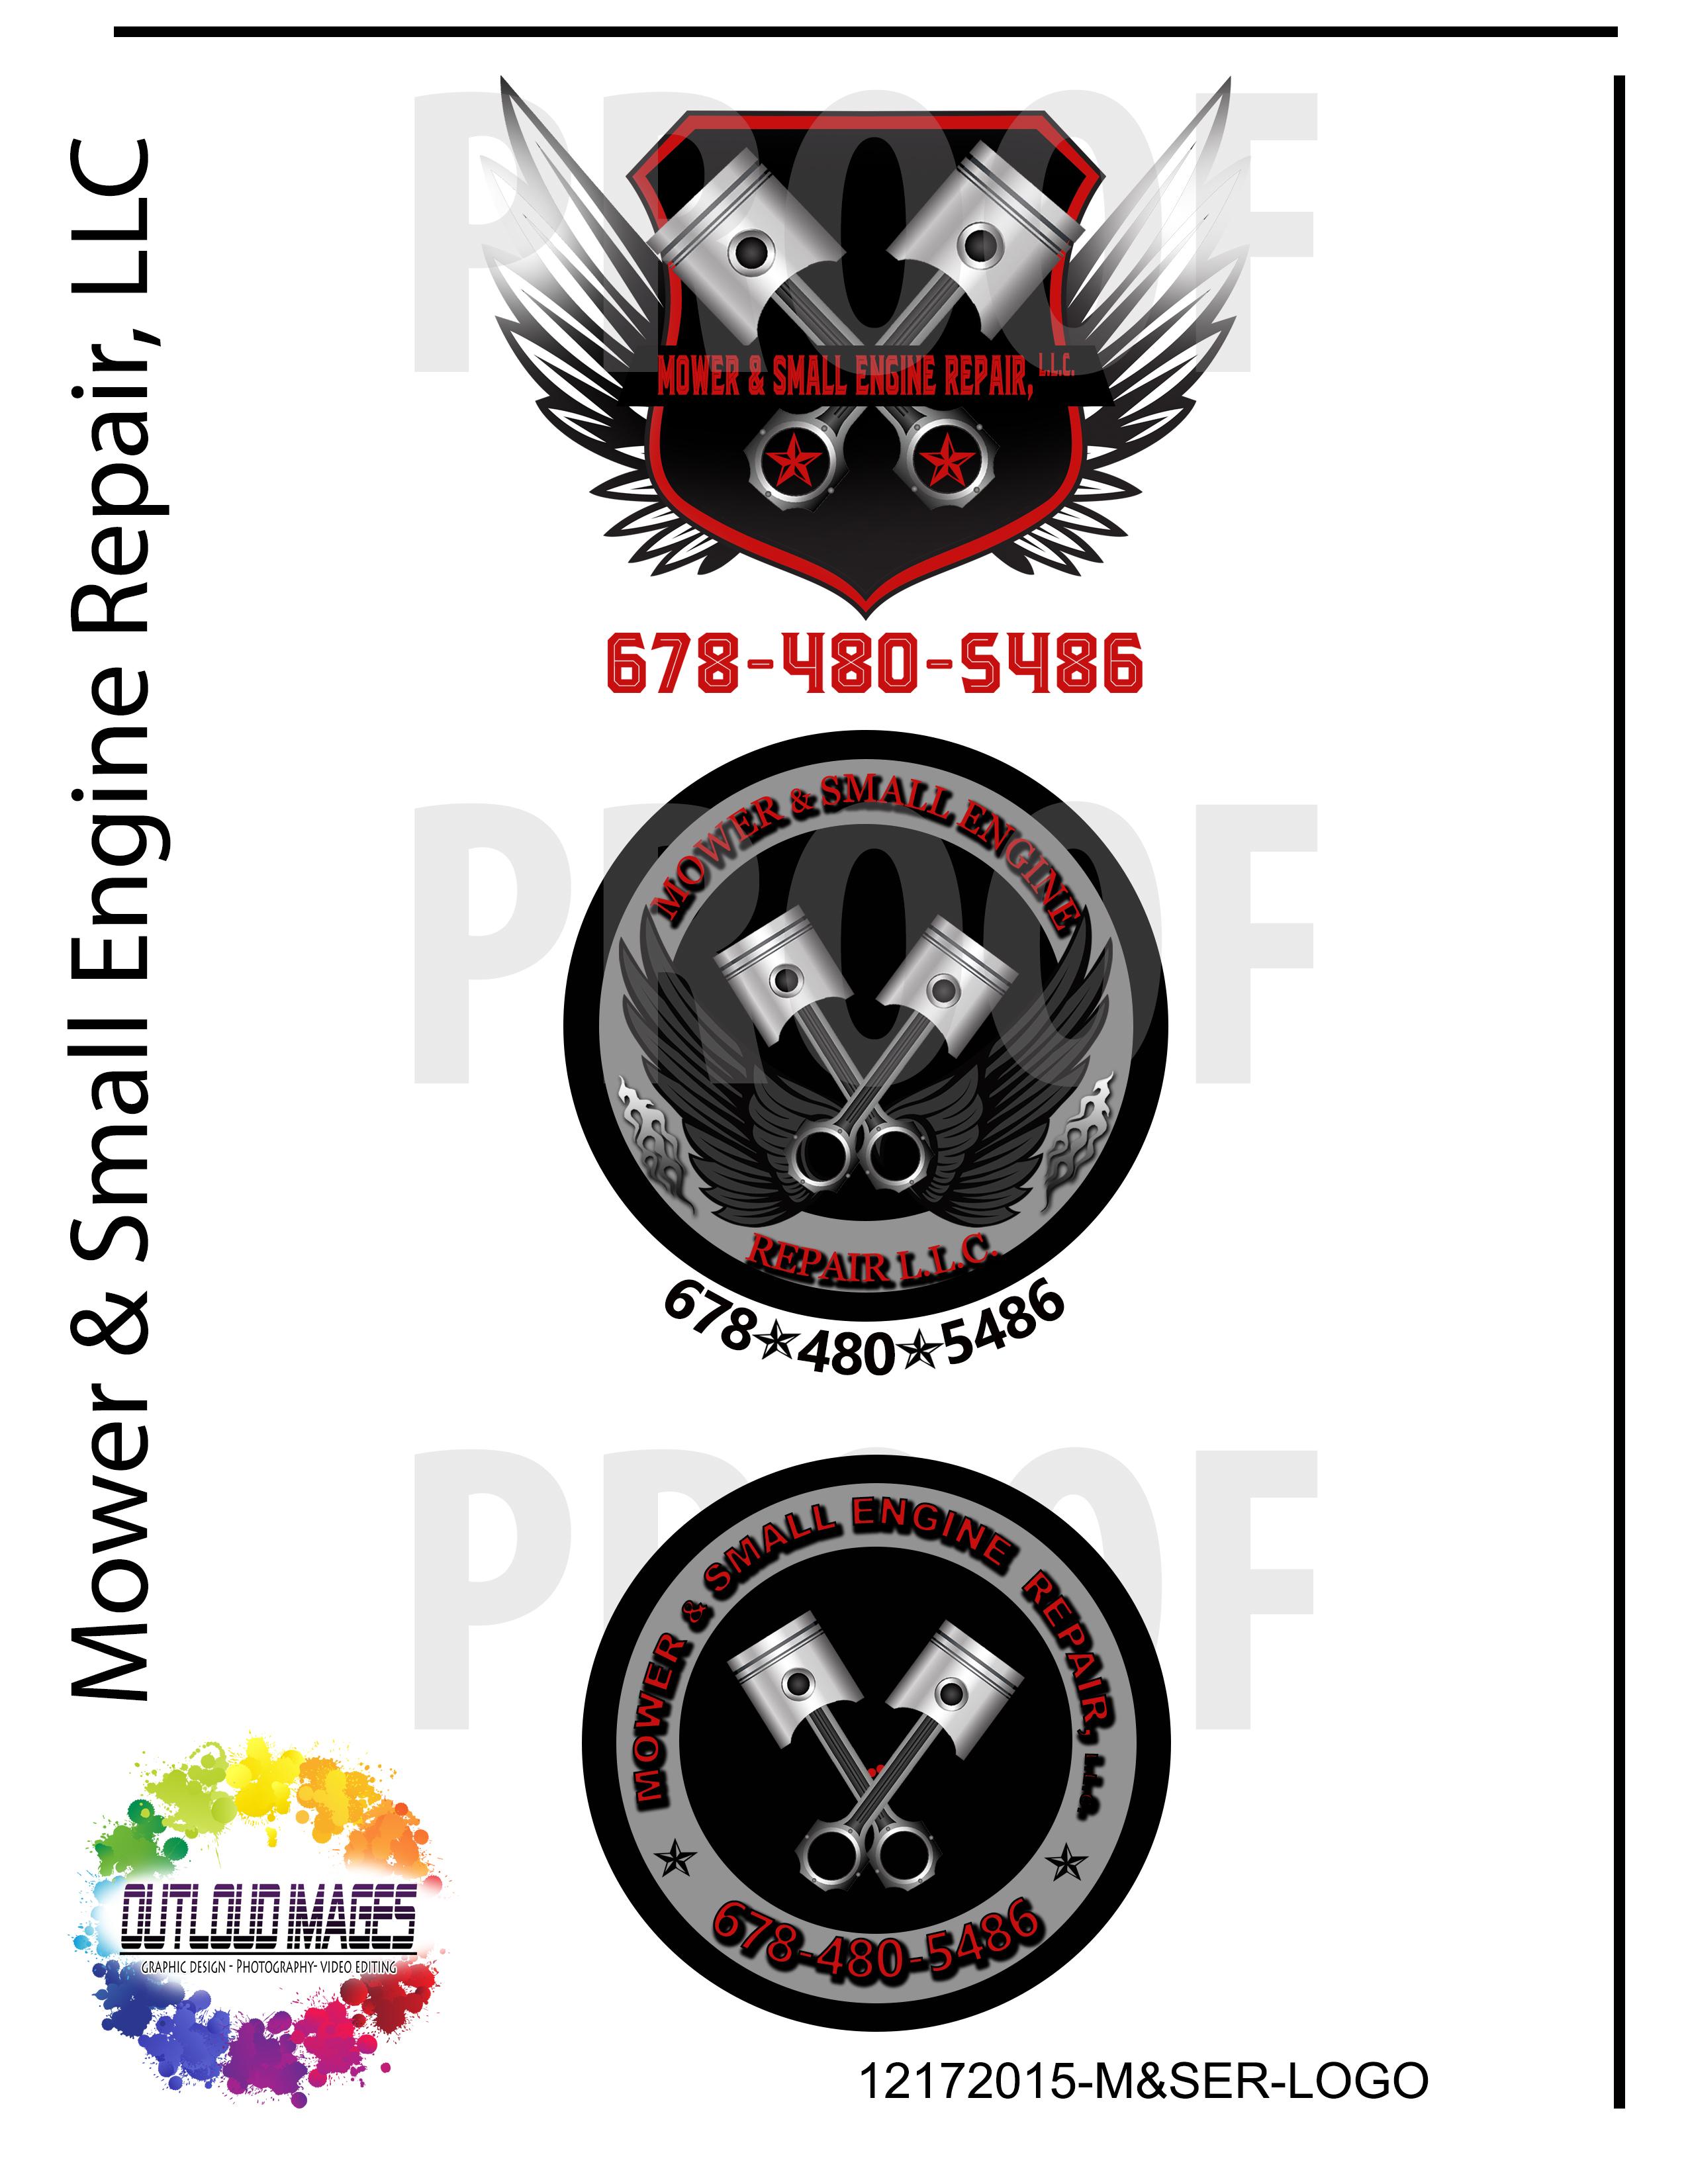 logo proof- mower & small engine repair